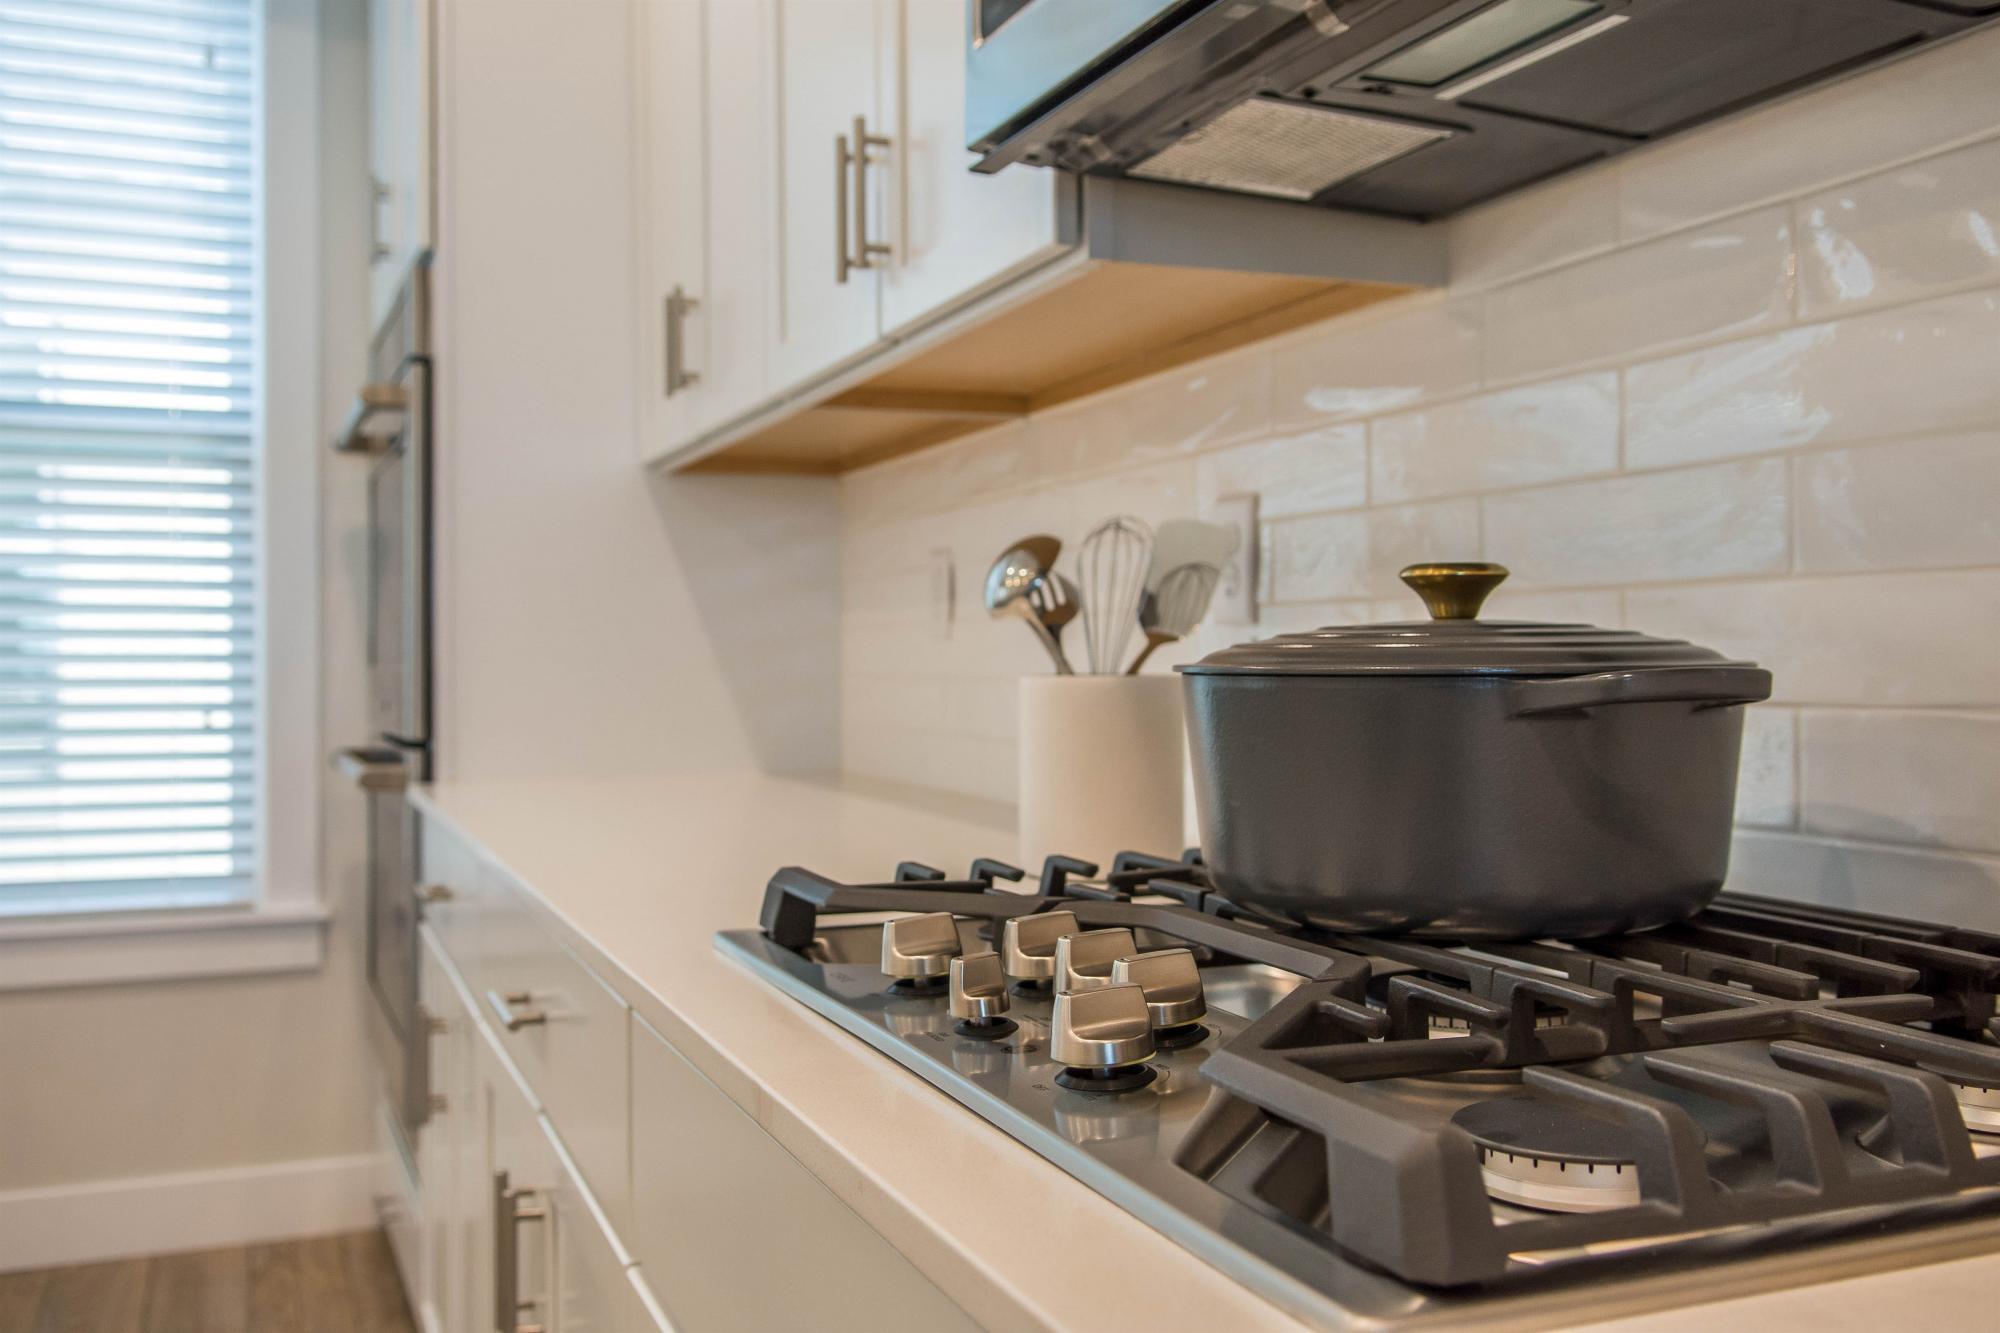 Kitchen-in-4612 W. Serendipity Way-at-Daybreak - Lake Village Condos & Townhomes-in-South Jordan